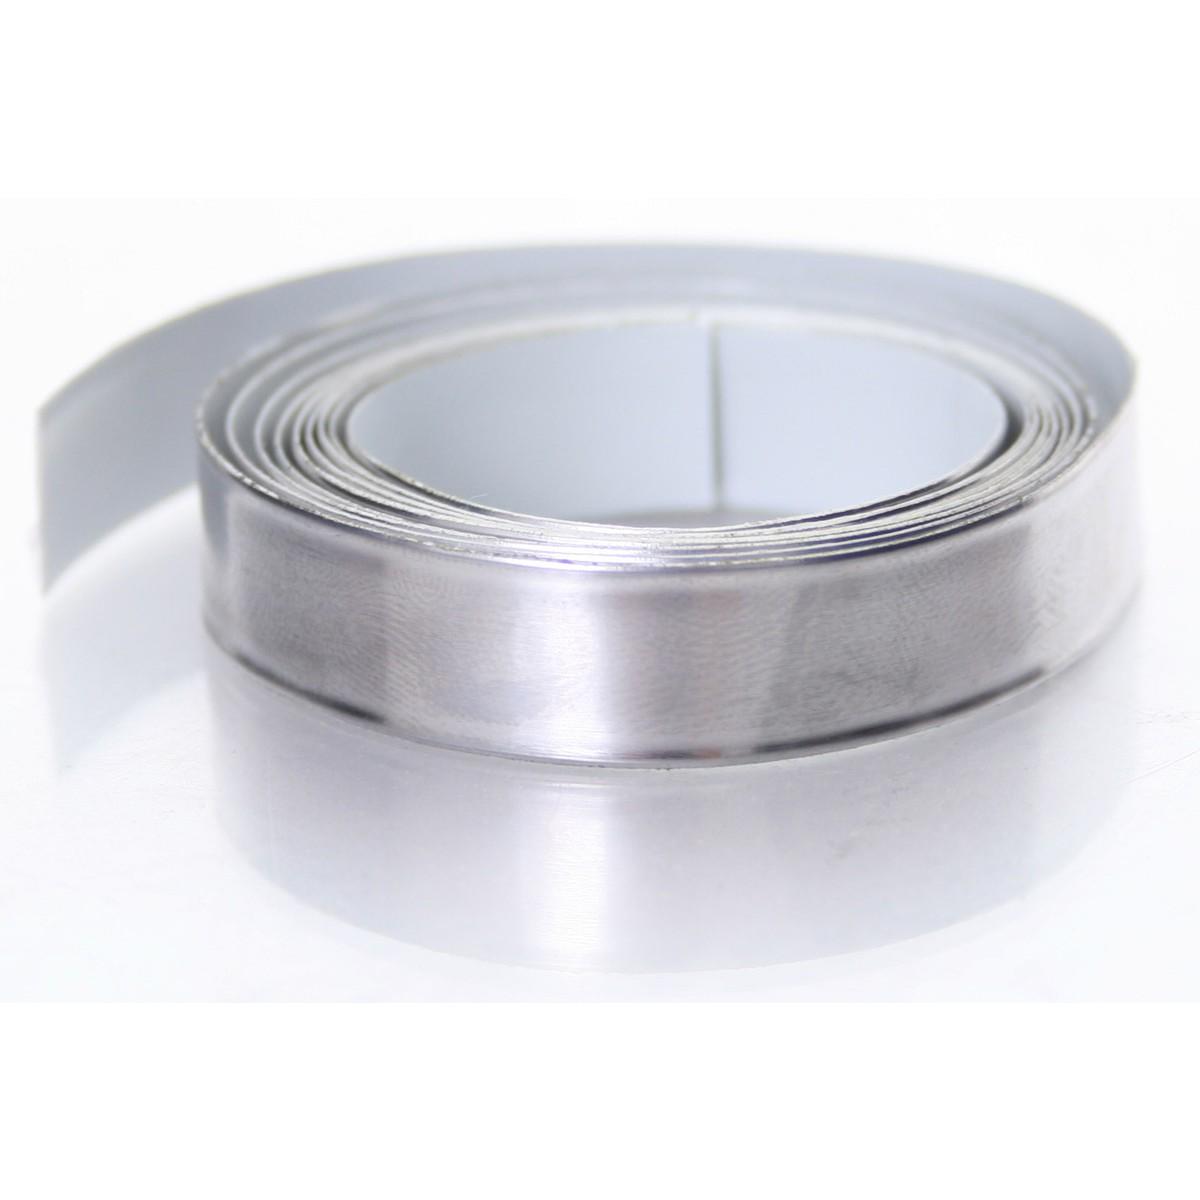 BANDE PLOMBEE 10 grammes (9 mm x 68.5 cm)